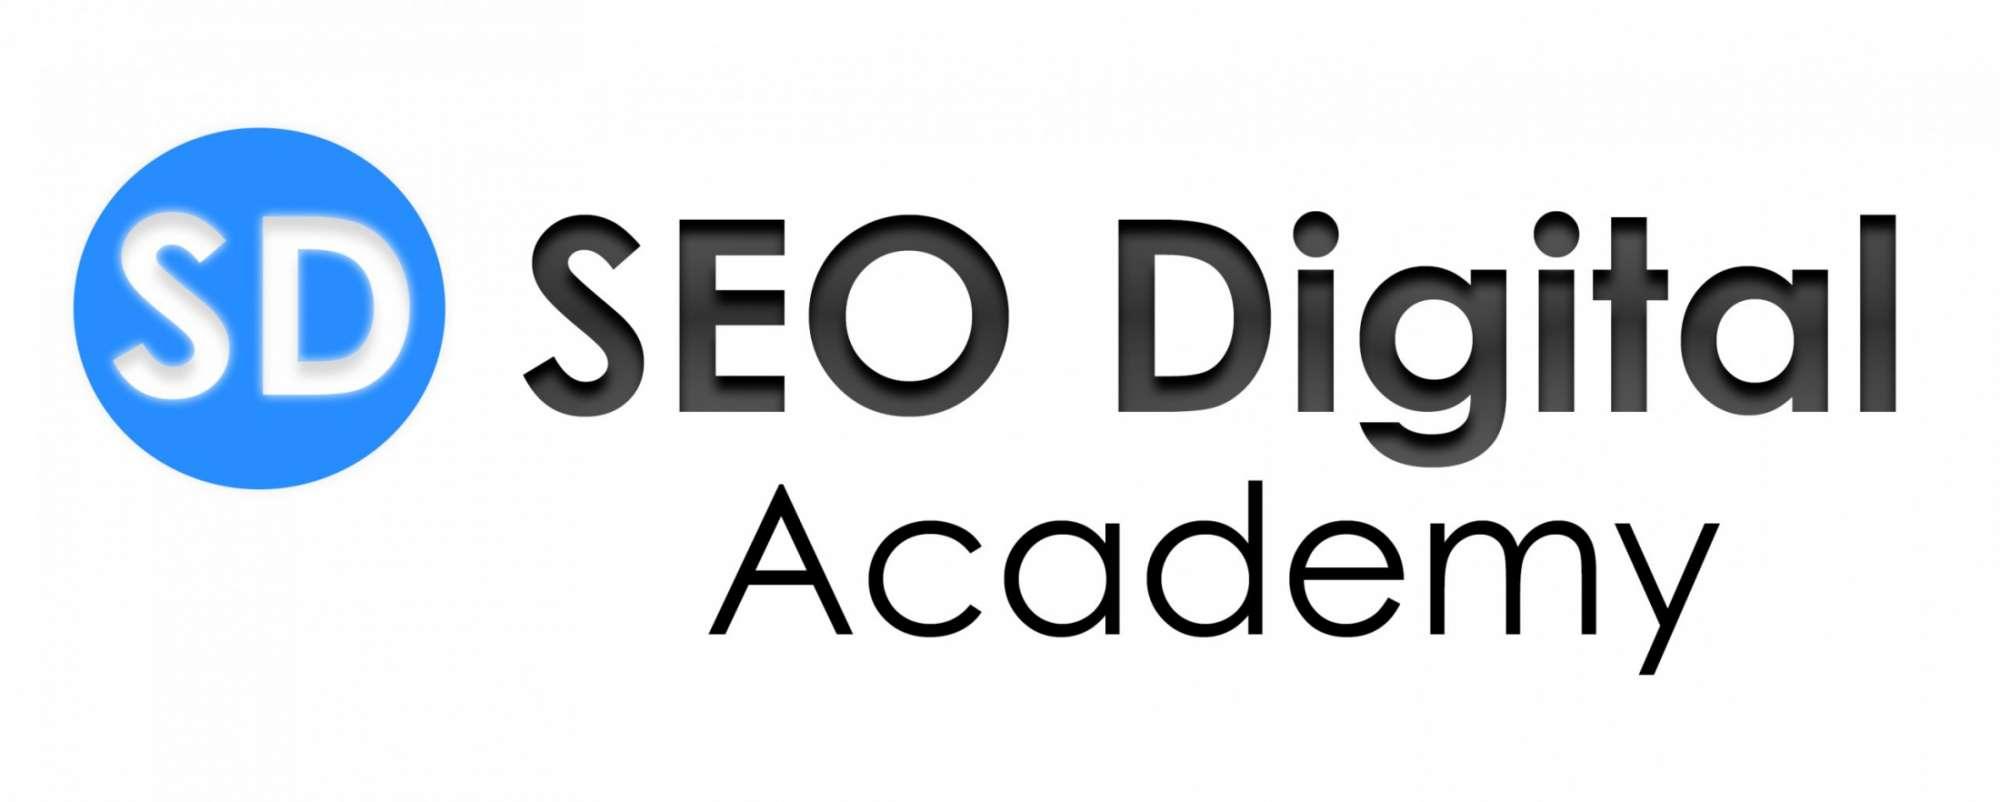 SEO Digital Academy